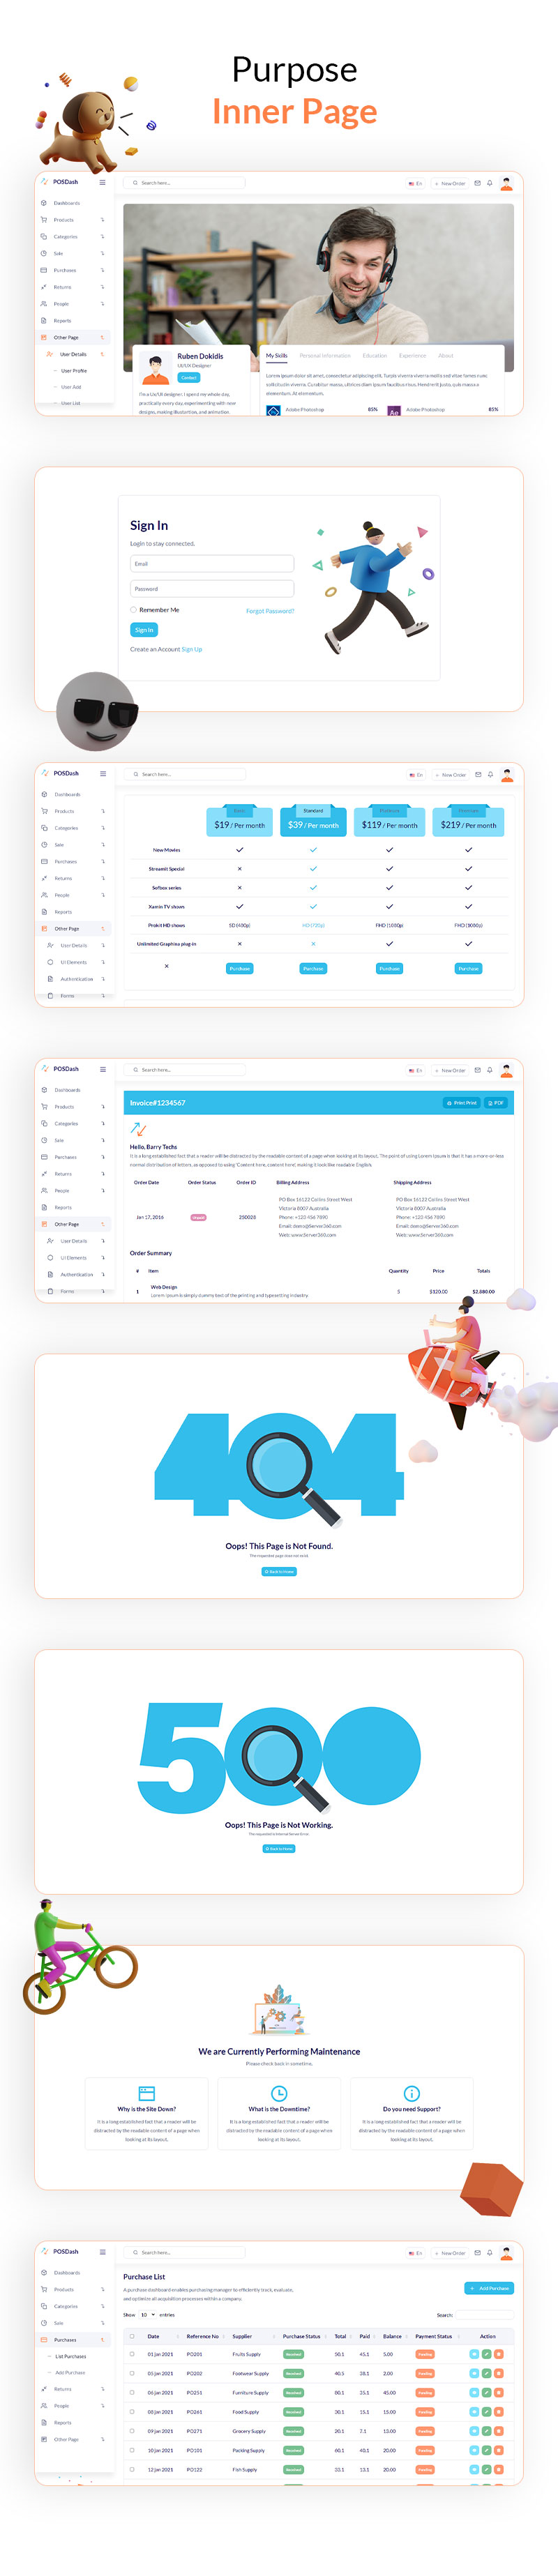 Dashboard UI Design Templates   PosDash   Iqonic Design vuejs html inventory admin template POSDash 4